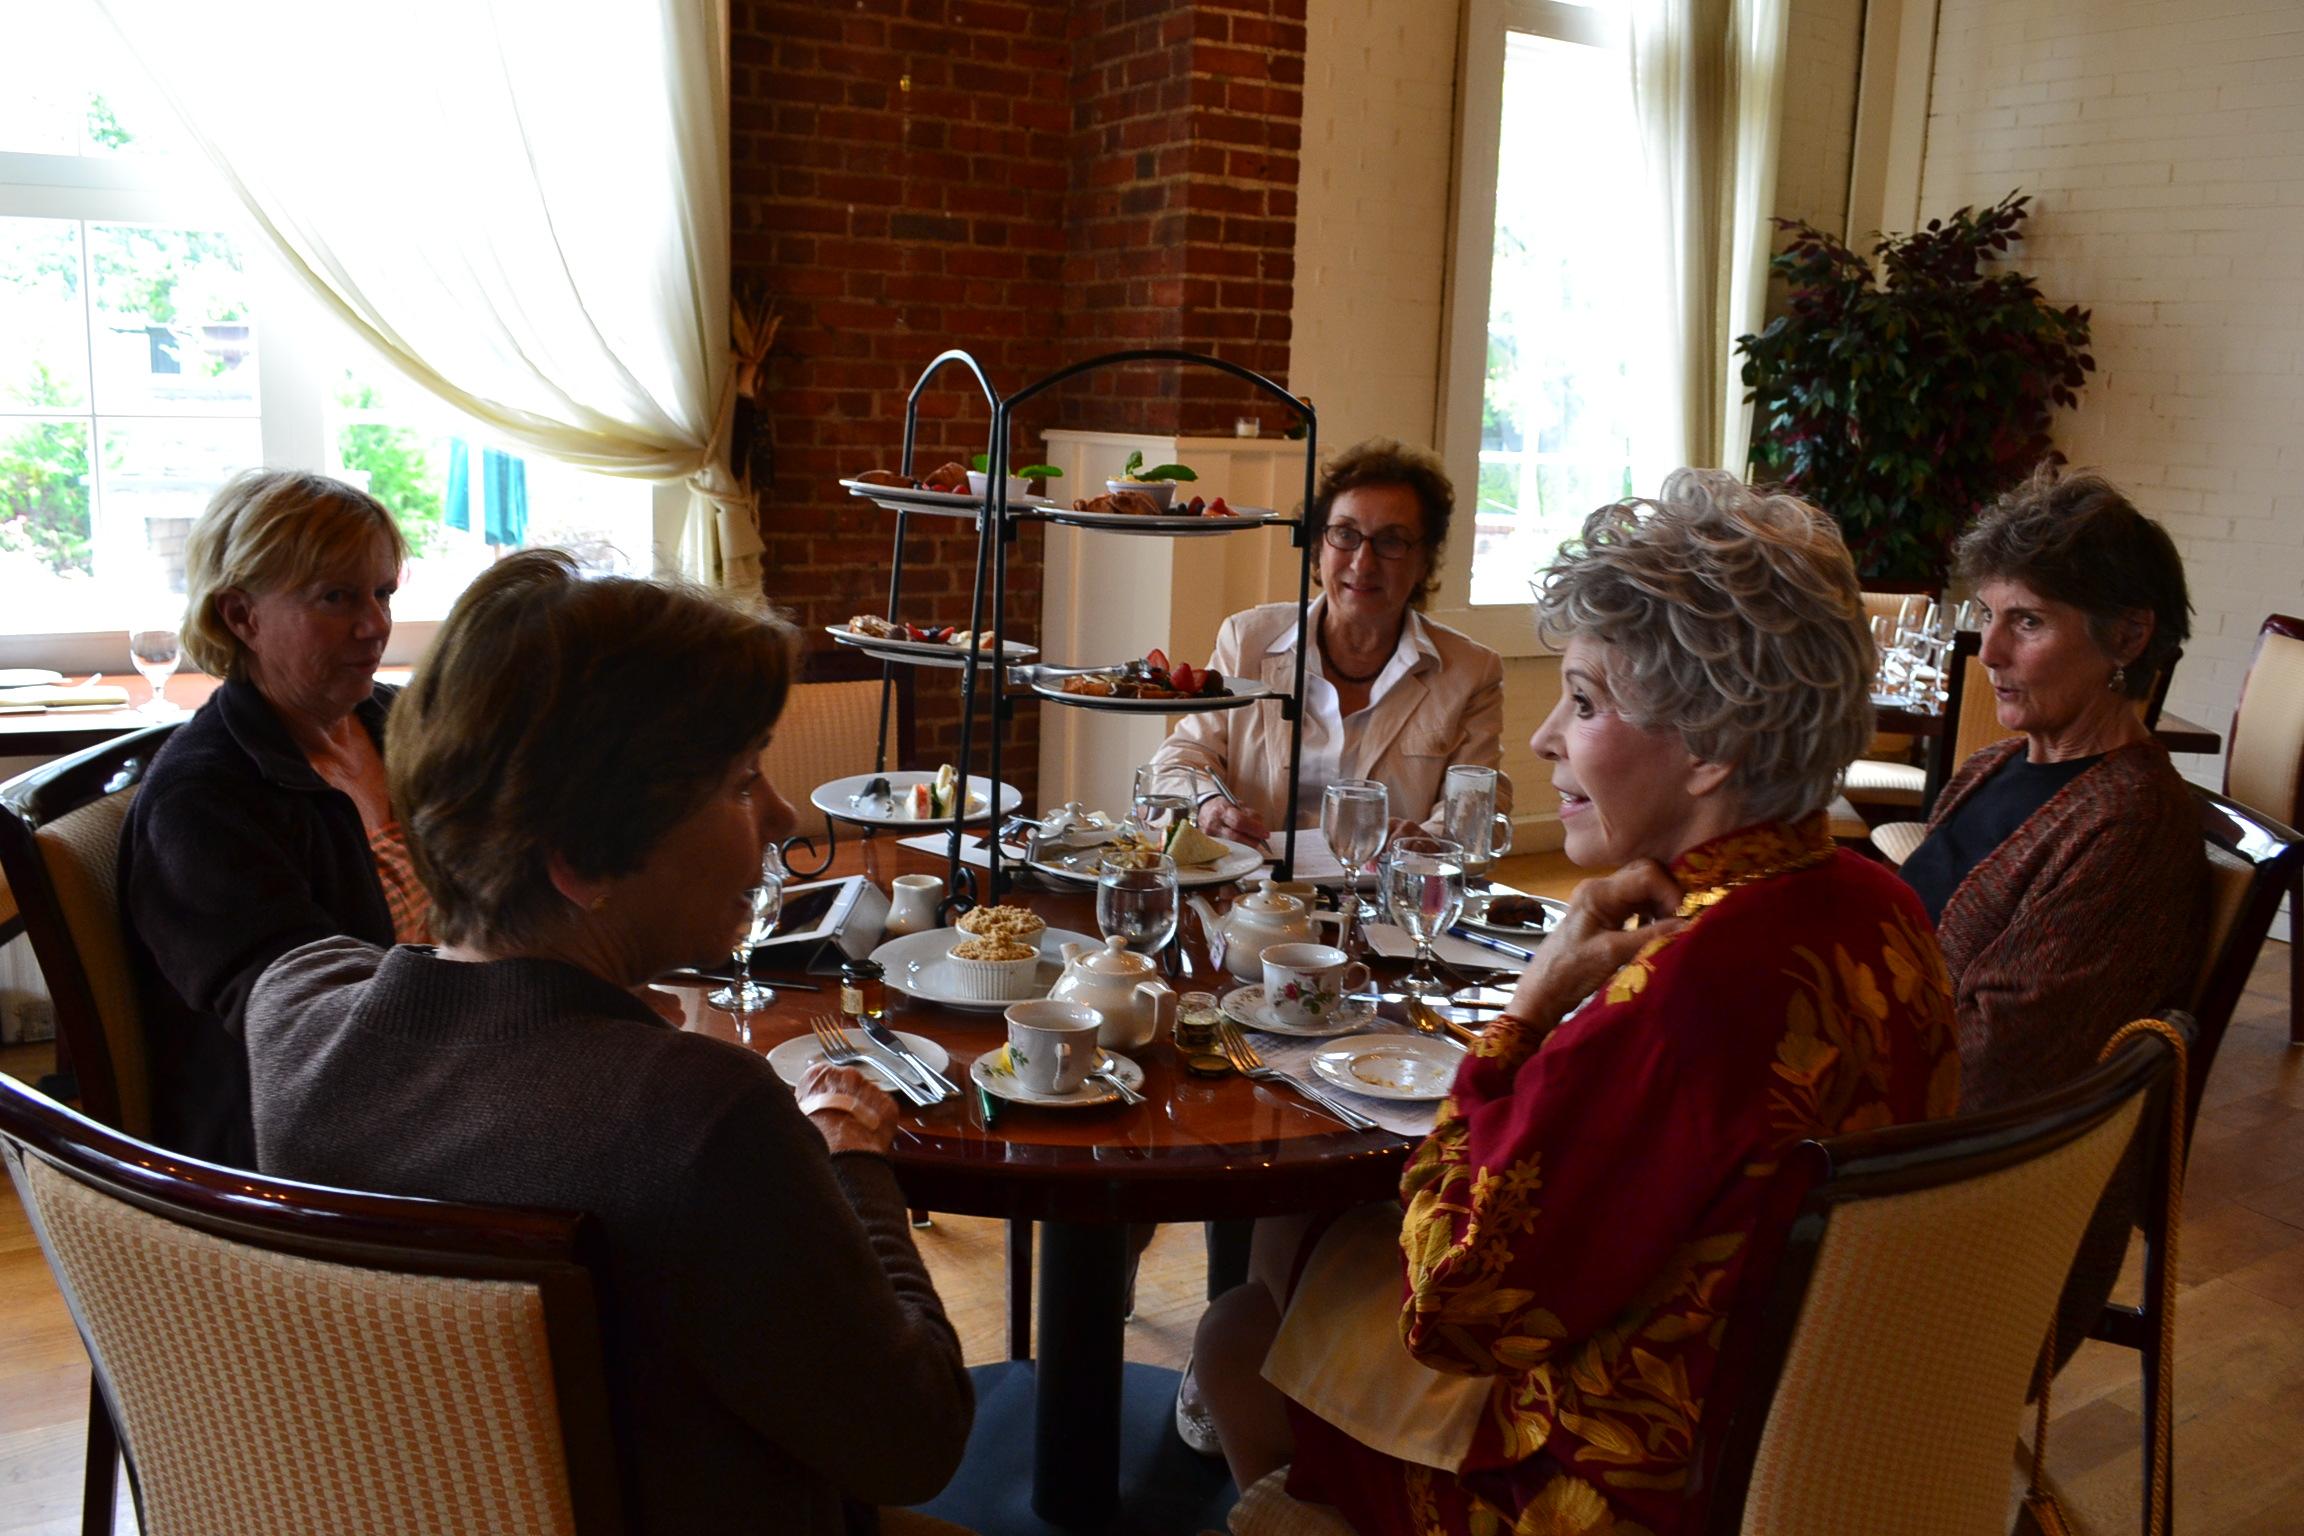 Newport Ri News >> Hotel Viking Welcomes 5th Season of Downton Abbey with ...